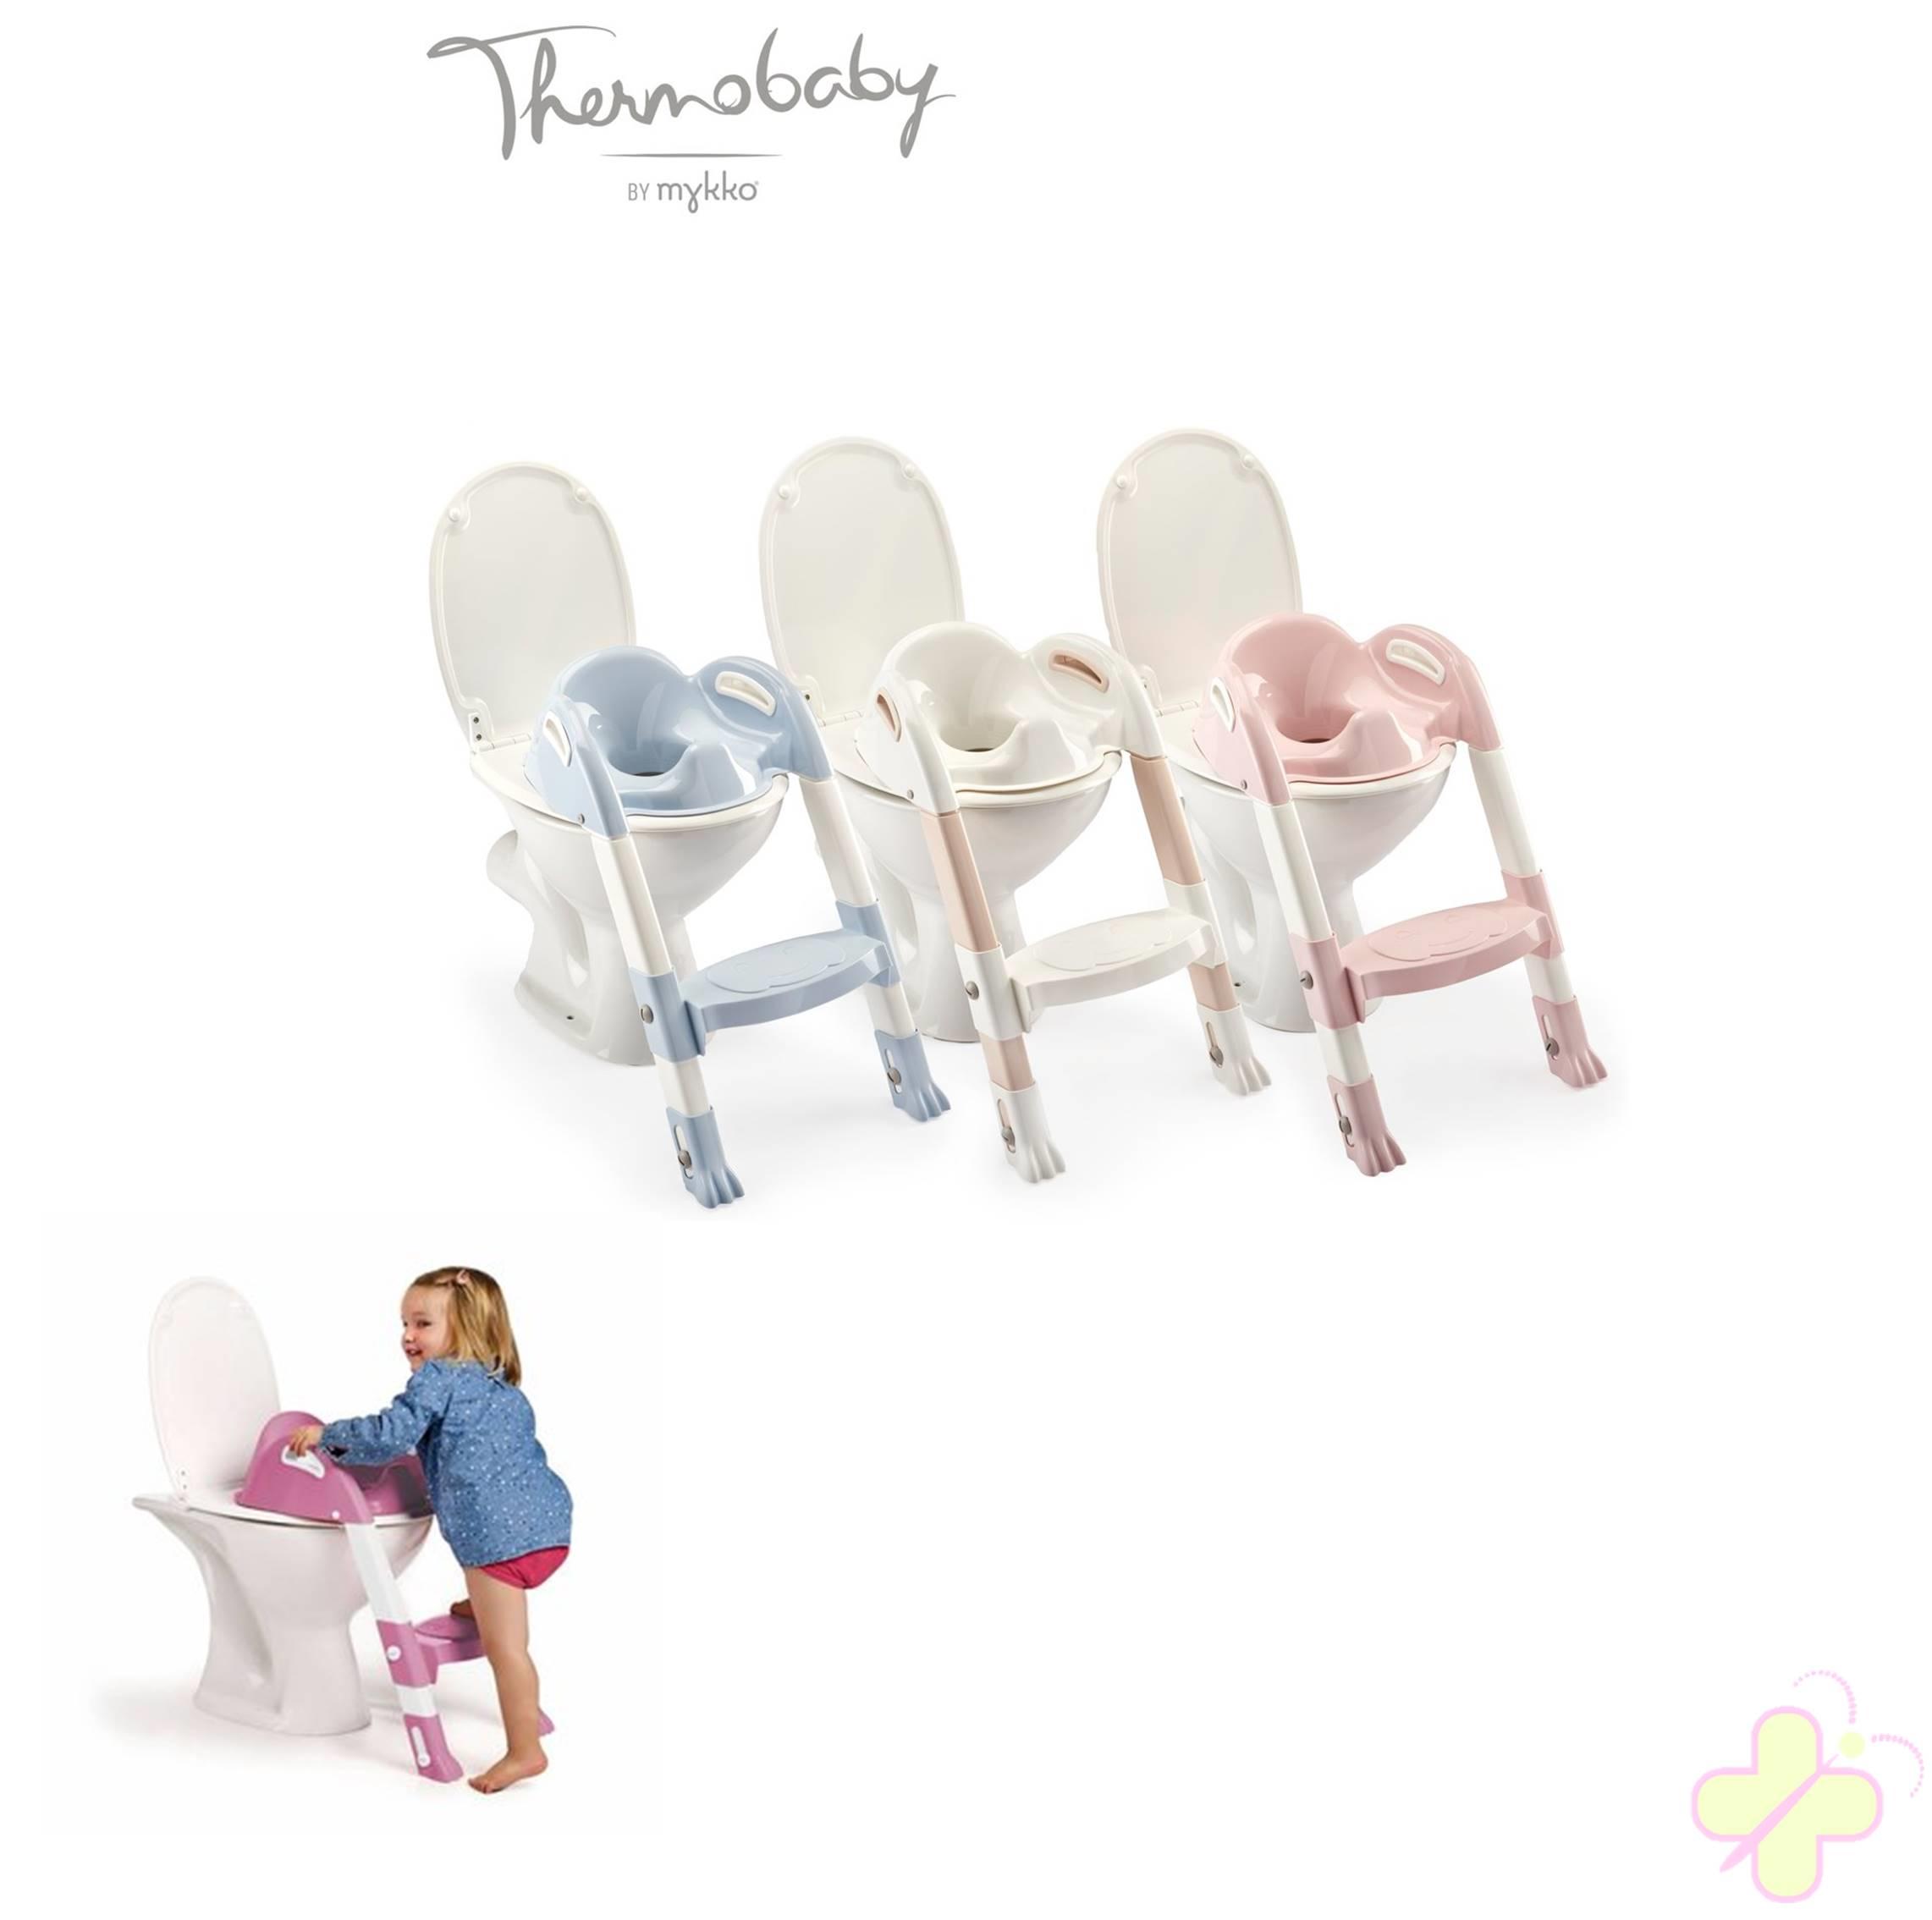 Thermobaby Kiddyloo Riduttore Con Scaletta Per Wc Farmasanitaria Dolce Infanzia Aversa